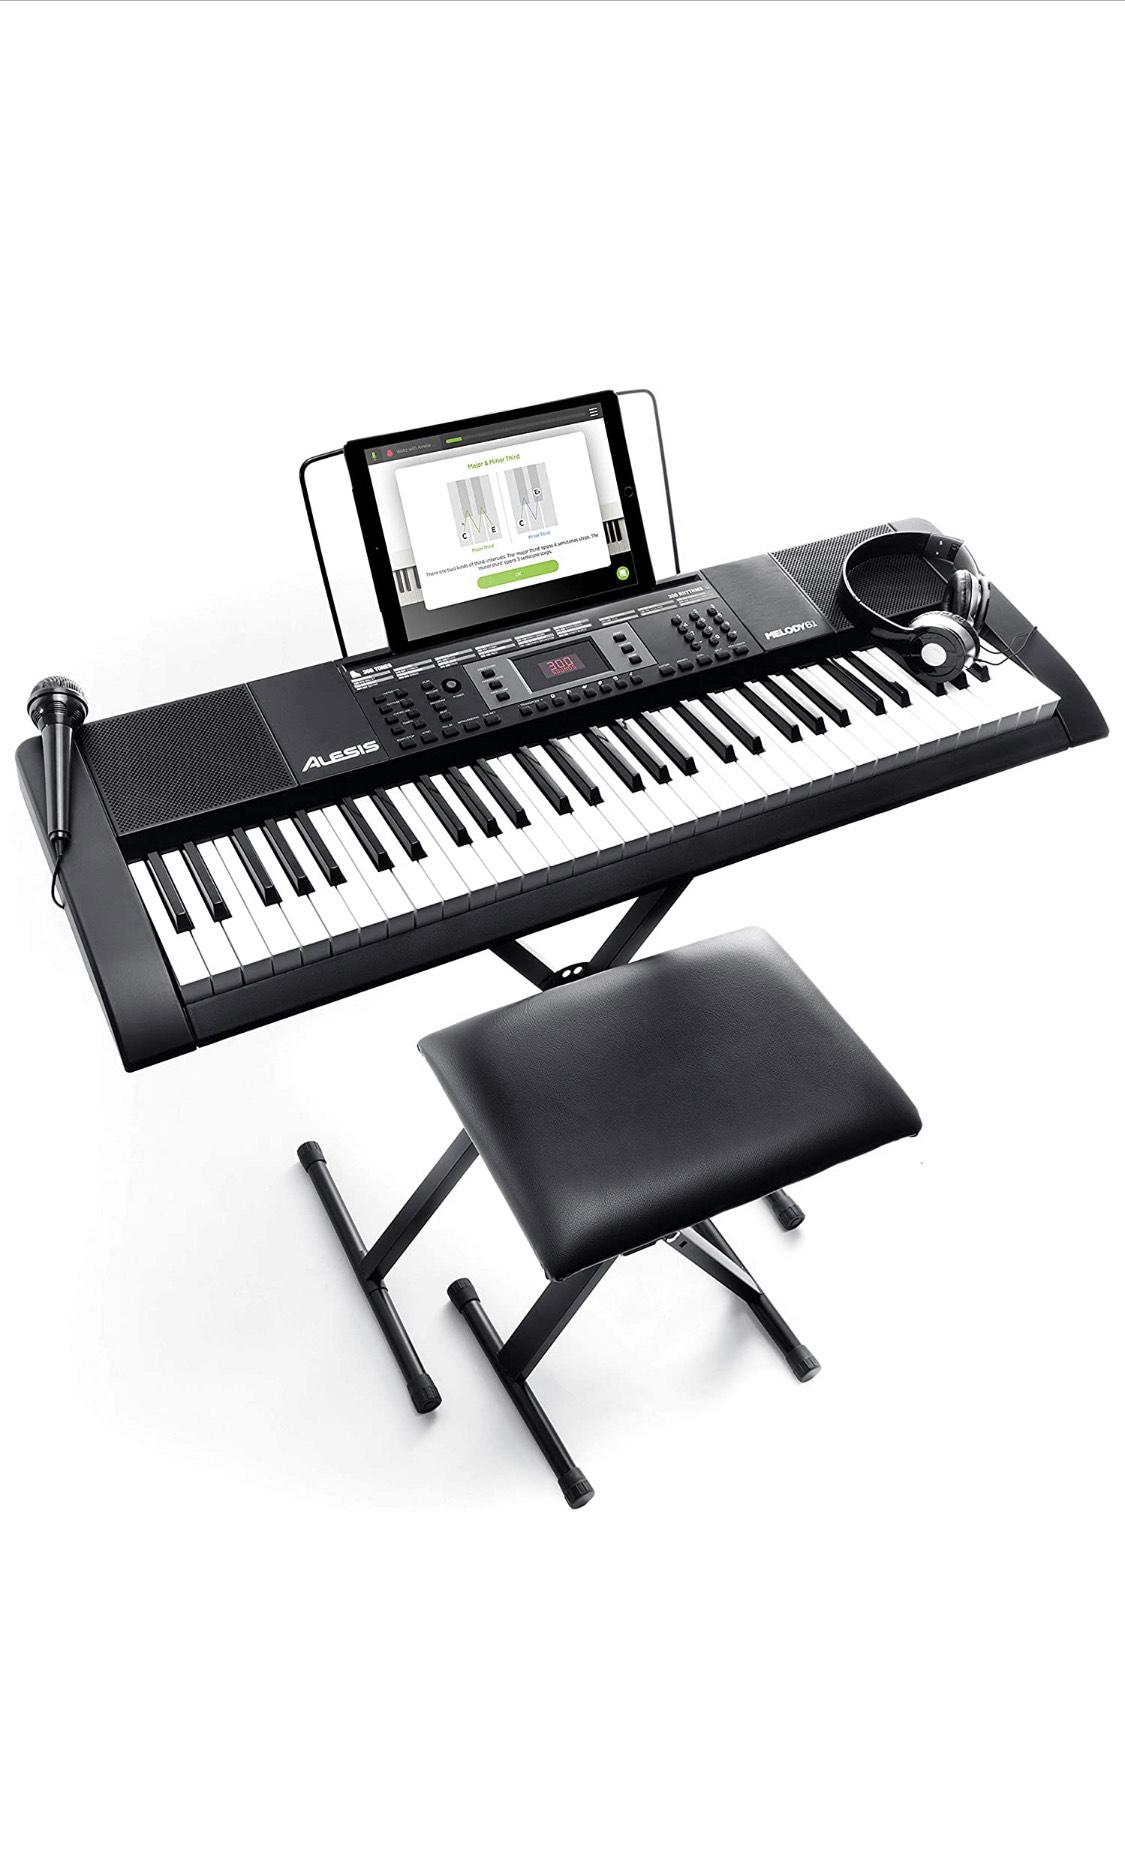 Piano 61 touches électronique portable Alesis Melody 61 MKII